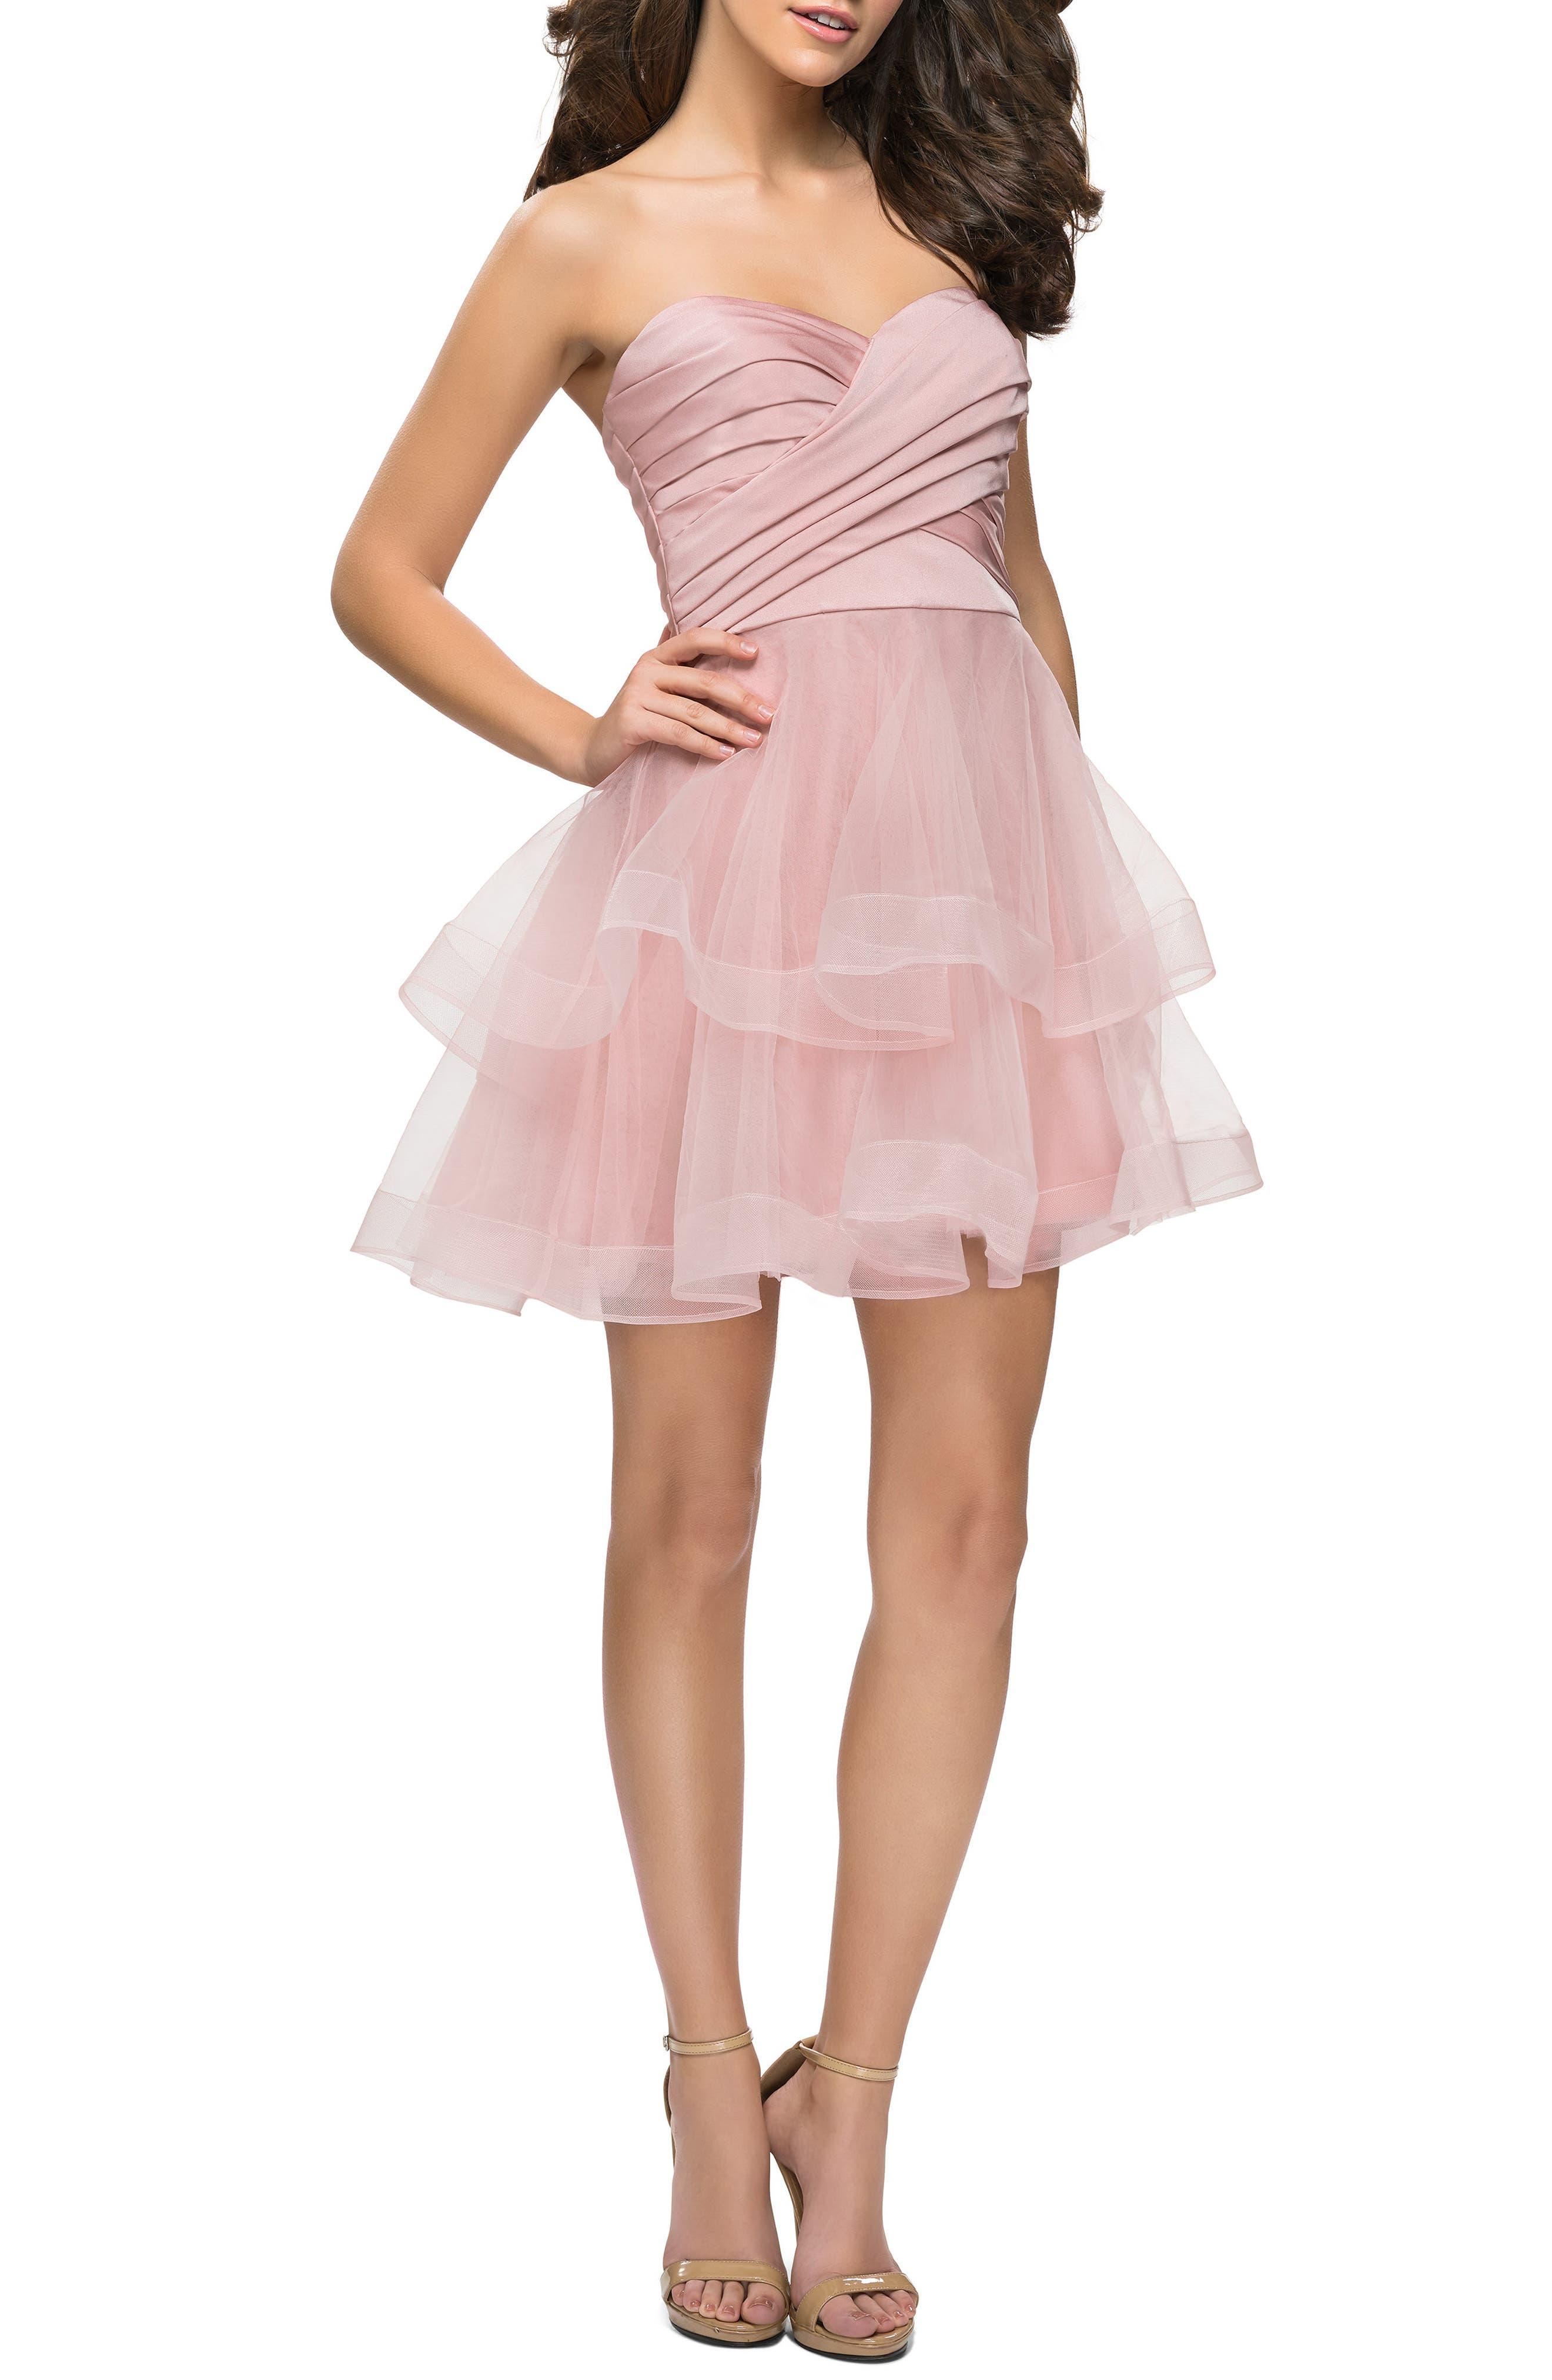 La Femme Tiered Tulle Minidress, Pink